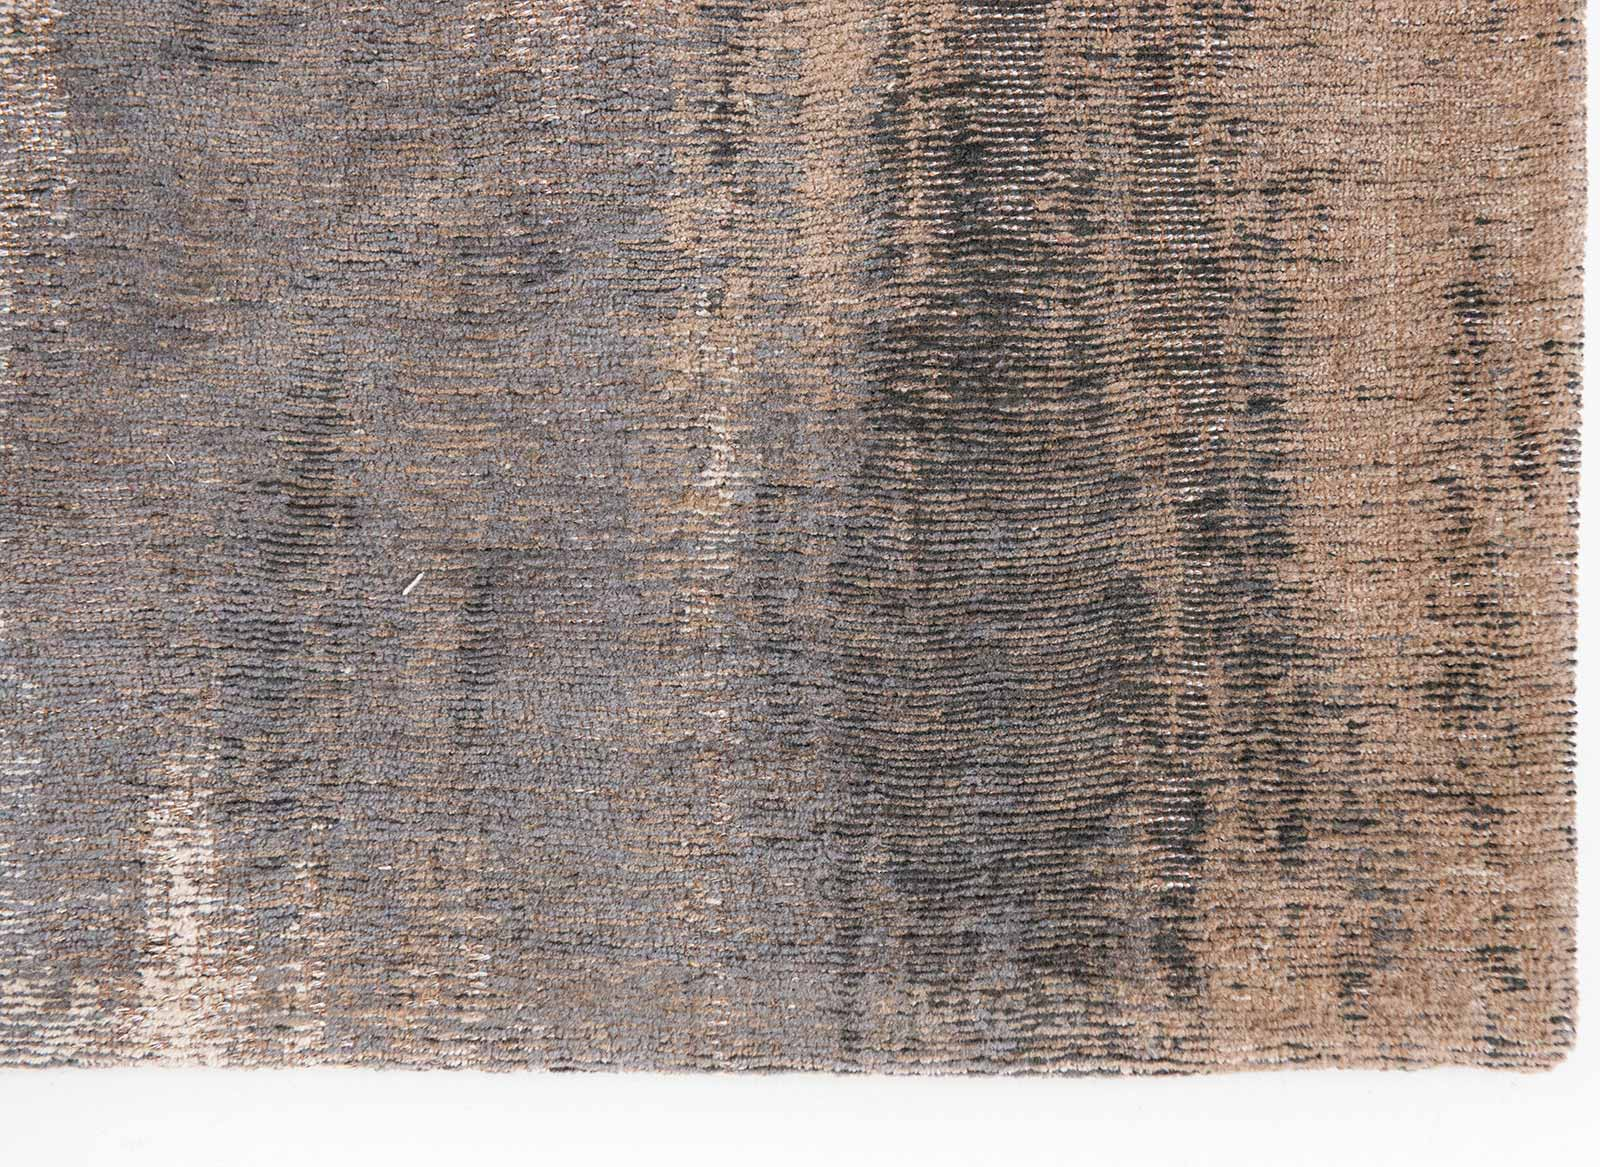 Louis De Poortere teppich LX 9121 Atlantic Monetti Giverny Beige corner